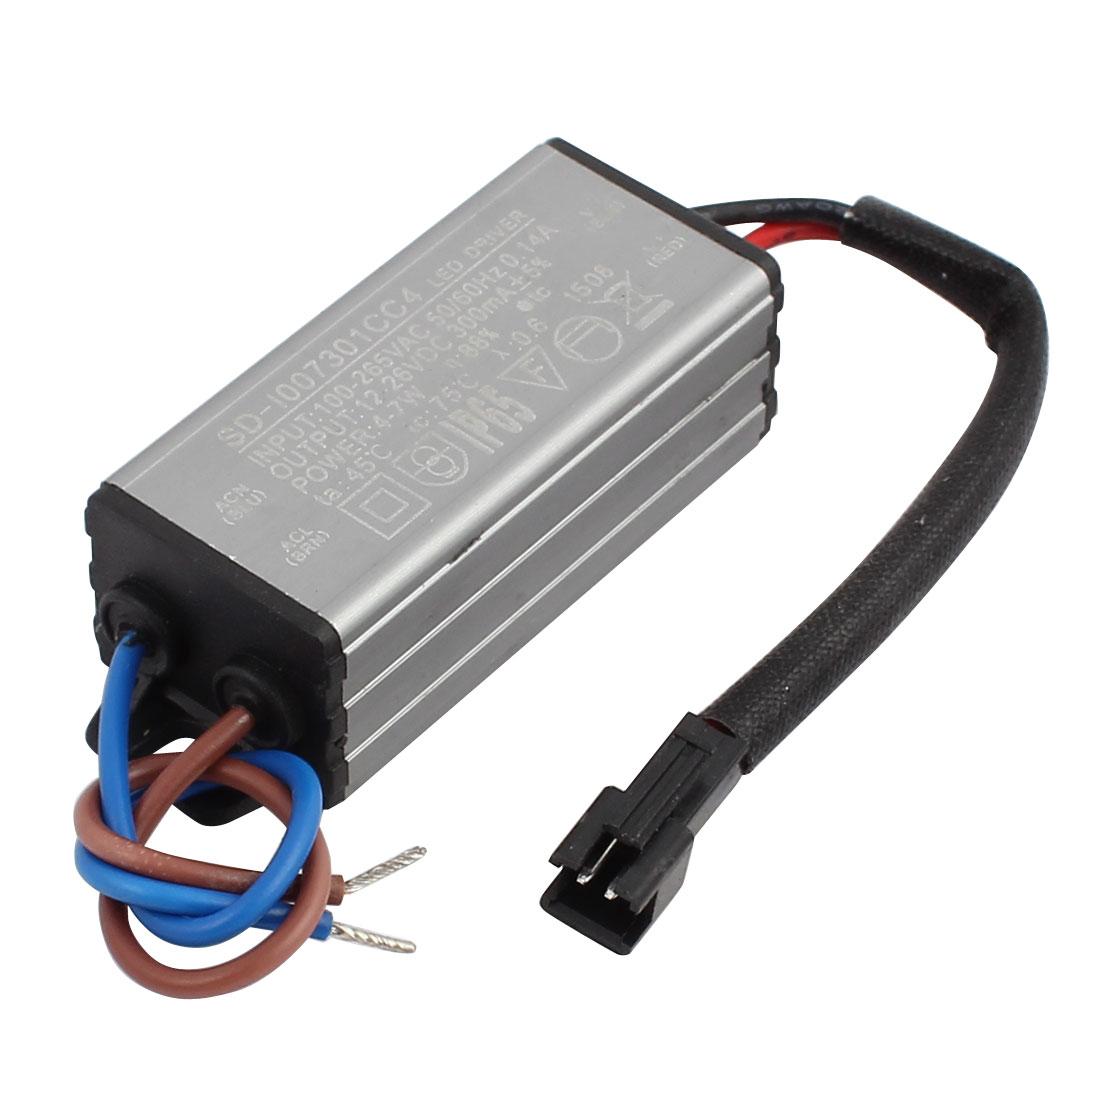 AC100-265V to DC12-26V 4-7W Transformer IP65 Waterproof LED Driver Power Supply